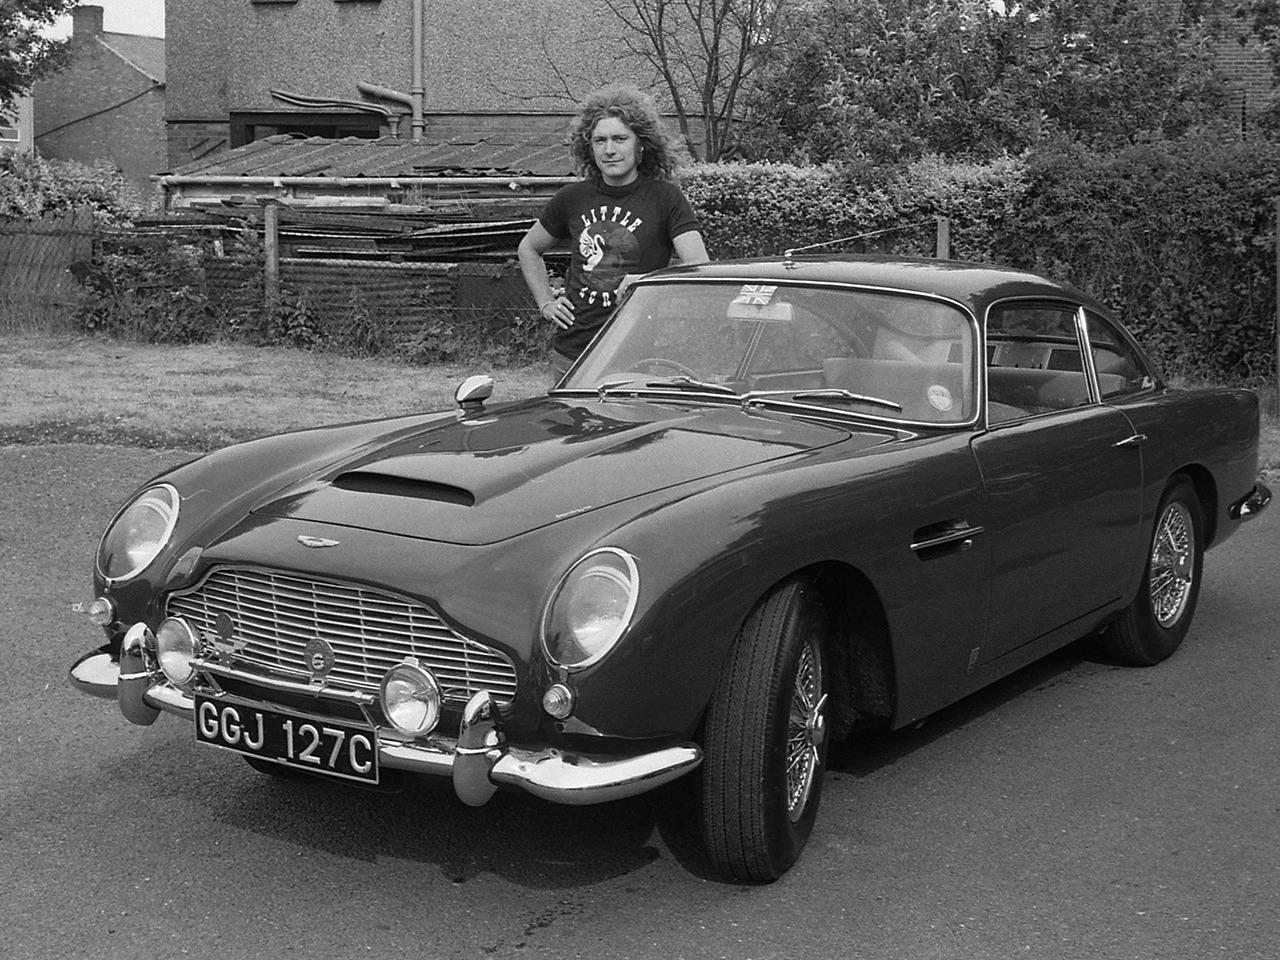 Aston Martin DB5 Robert Plant Led Zepellin – 1